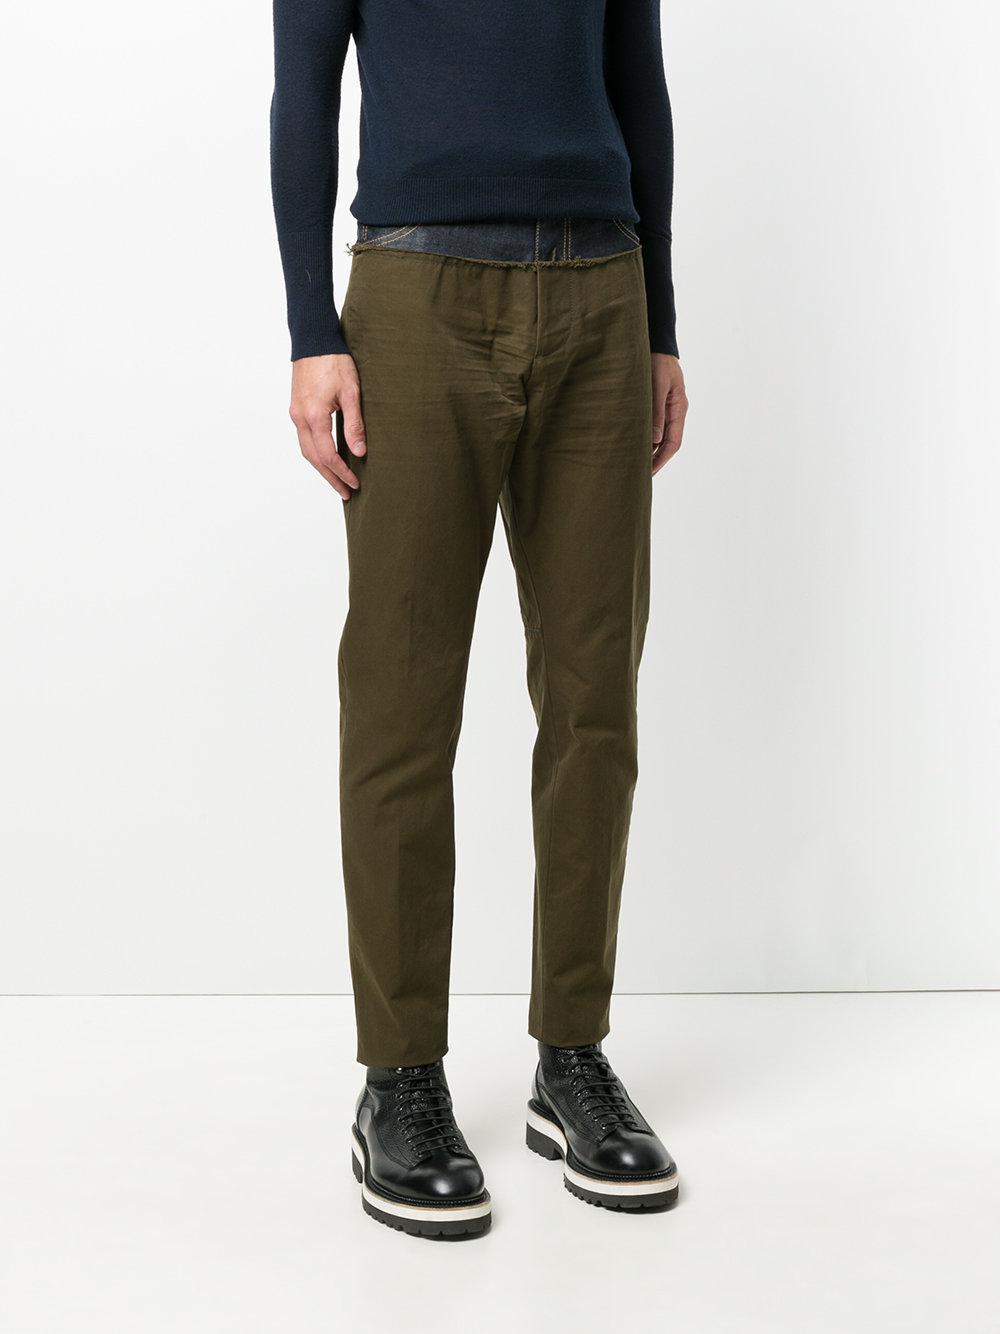 DSquared² Denim Jeans Bicolore A Gamba Dritta in Green for Men